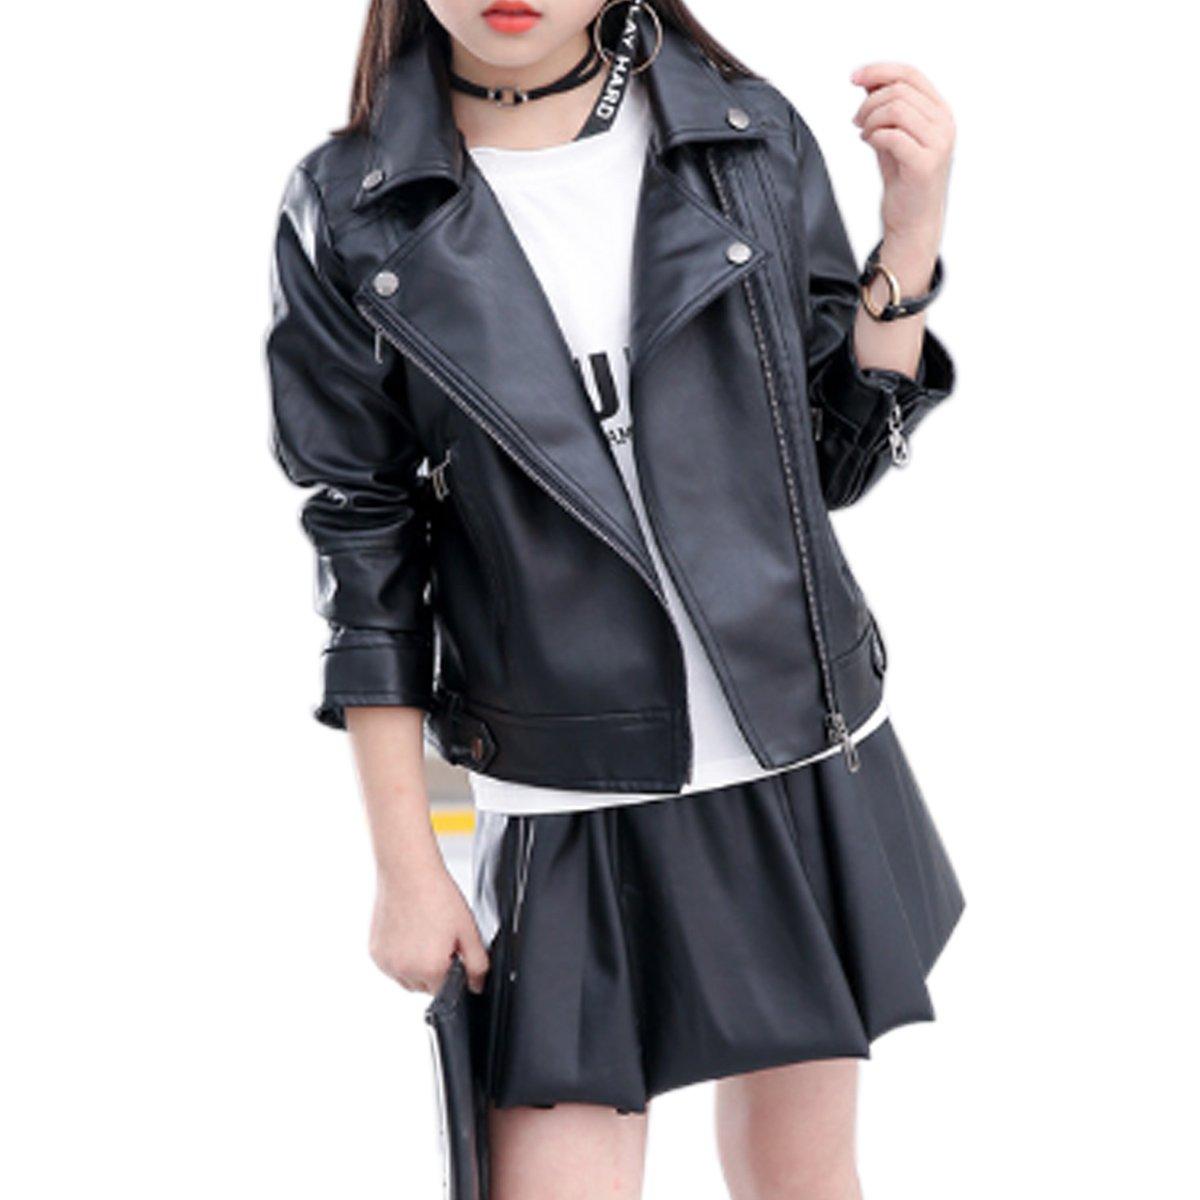 Elife Girls Fashion PU Leather Motorcycle Jacket Children's Outerwear Slim Coat Black 5-6Y …